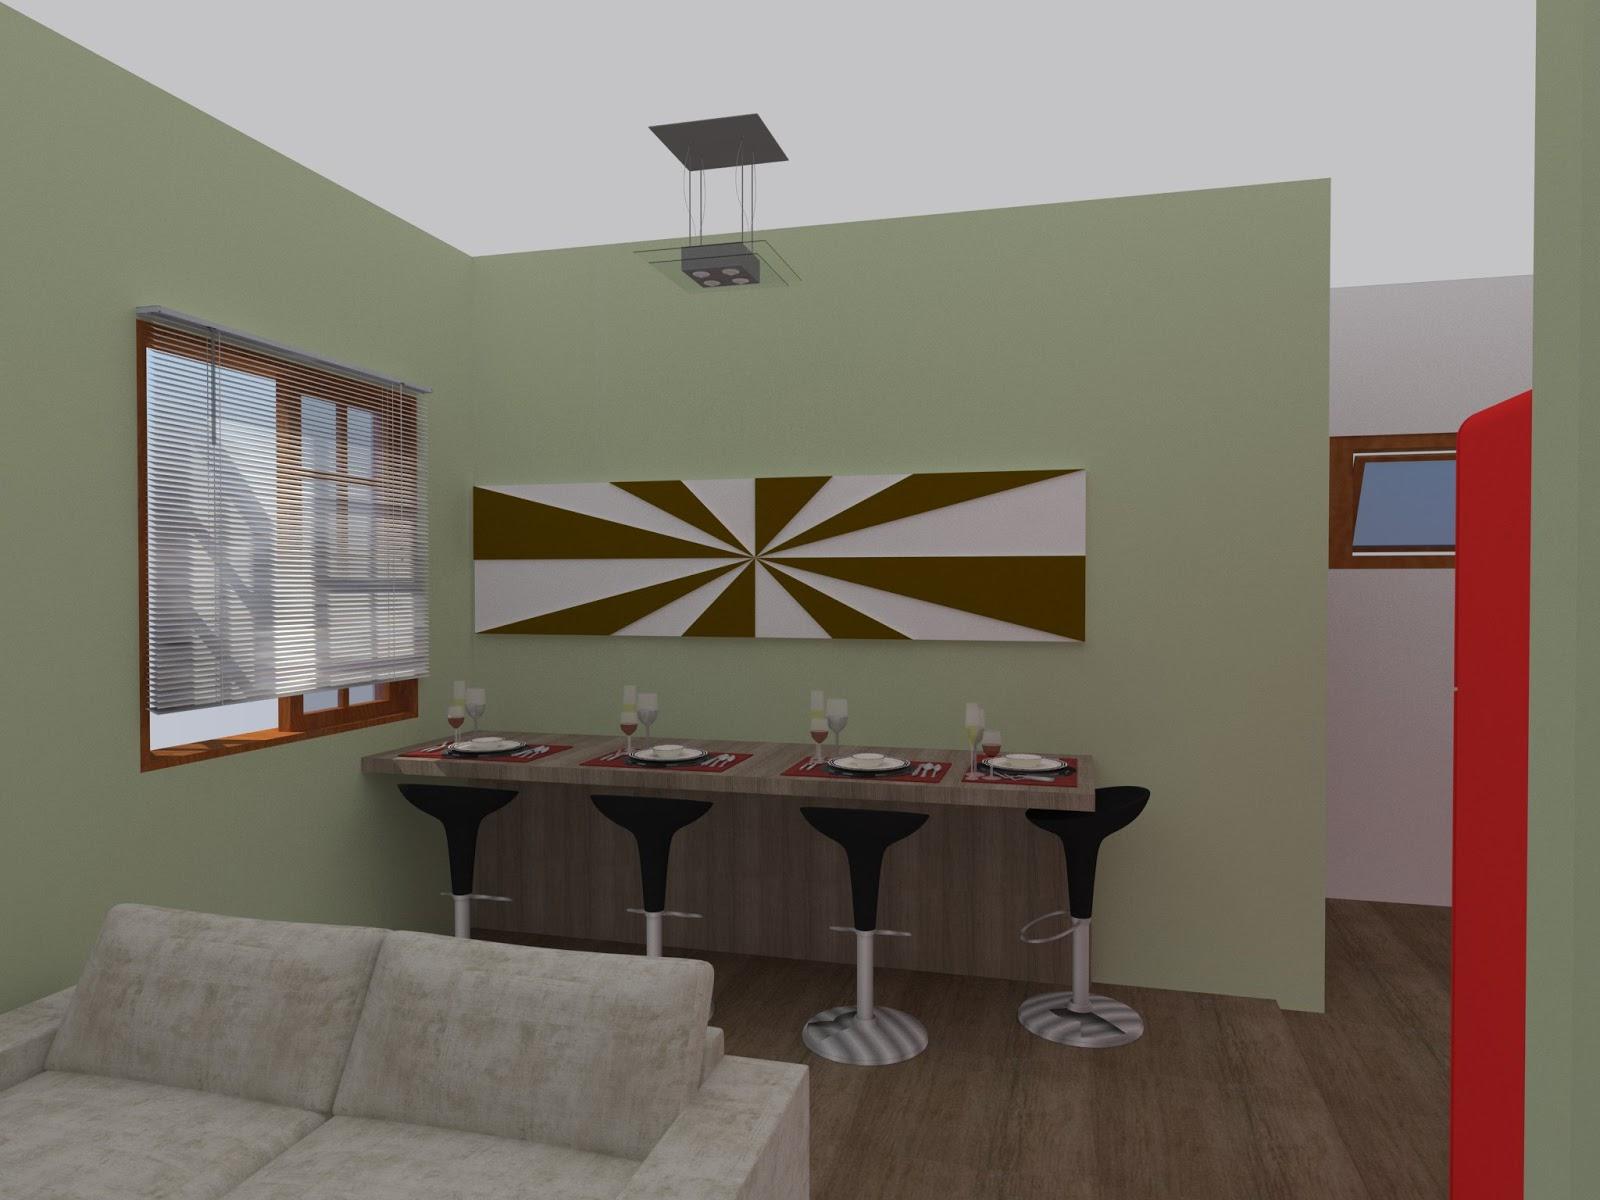 Curso tecnico design de interiores